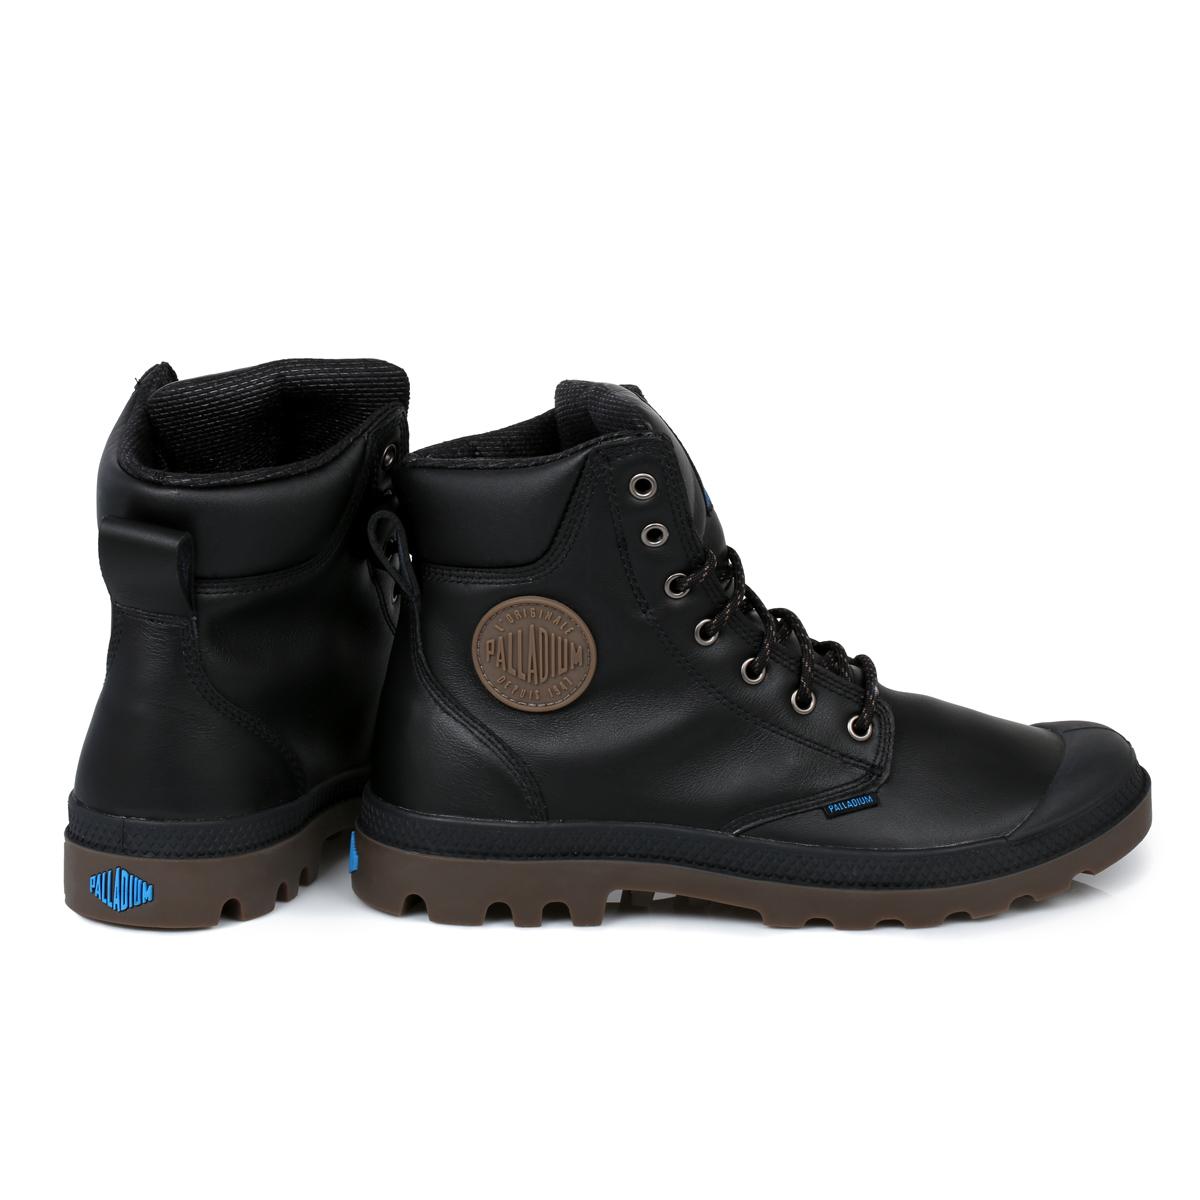 palladium black waterproof sport cuff mens boots size 7 11